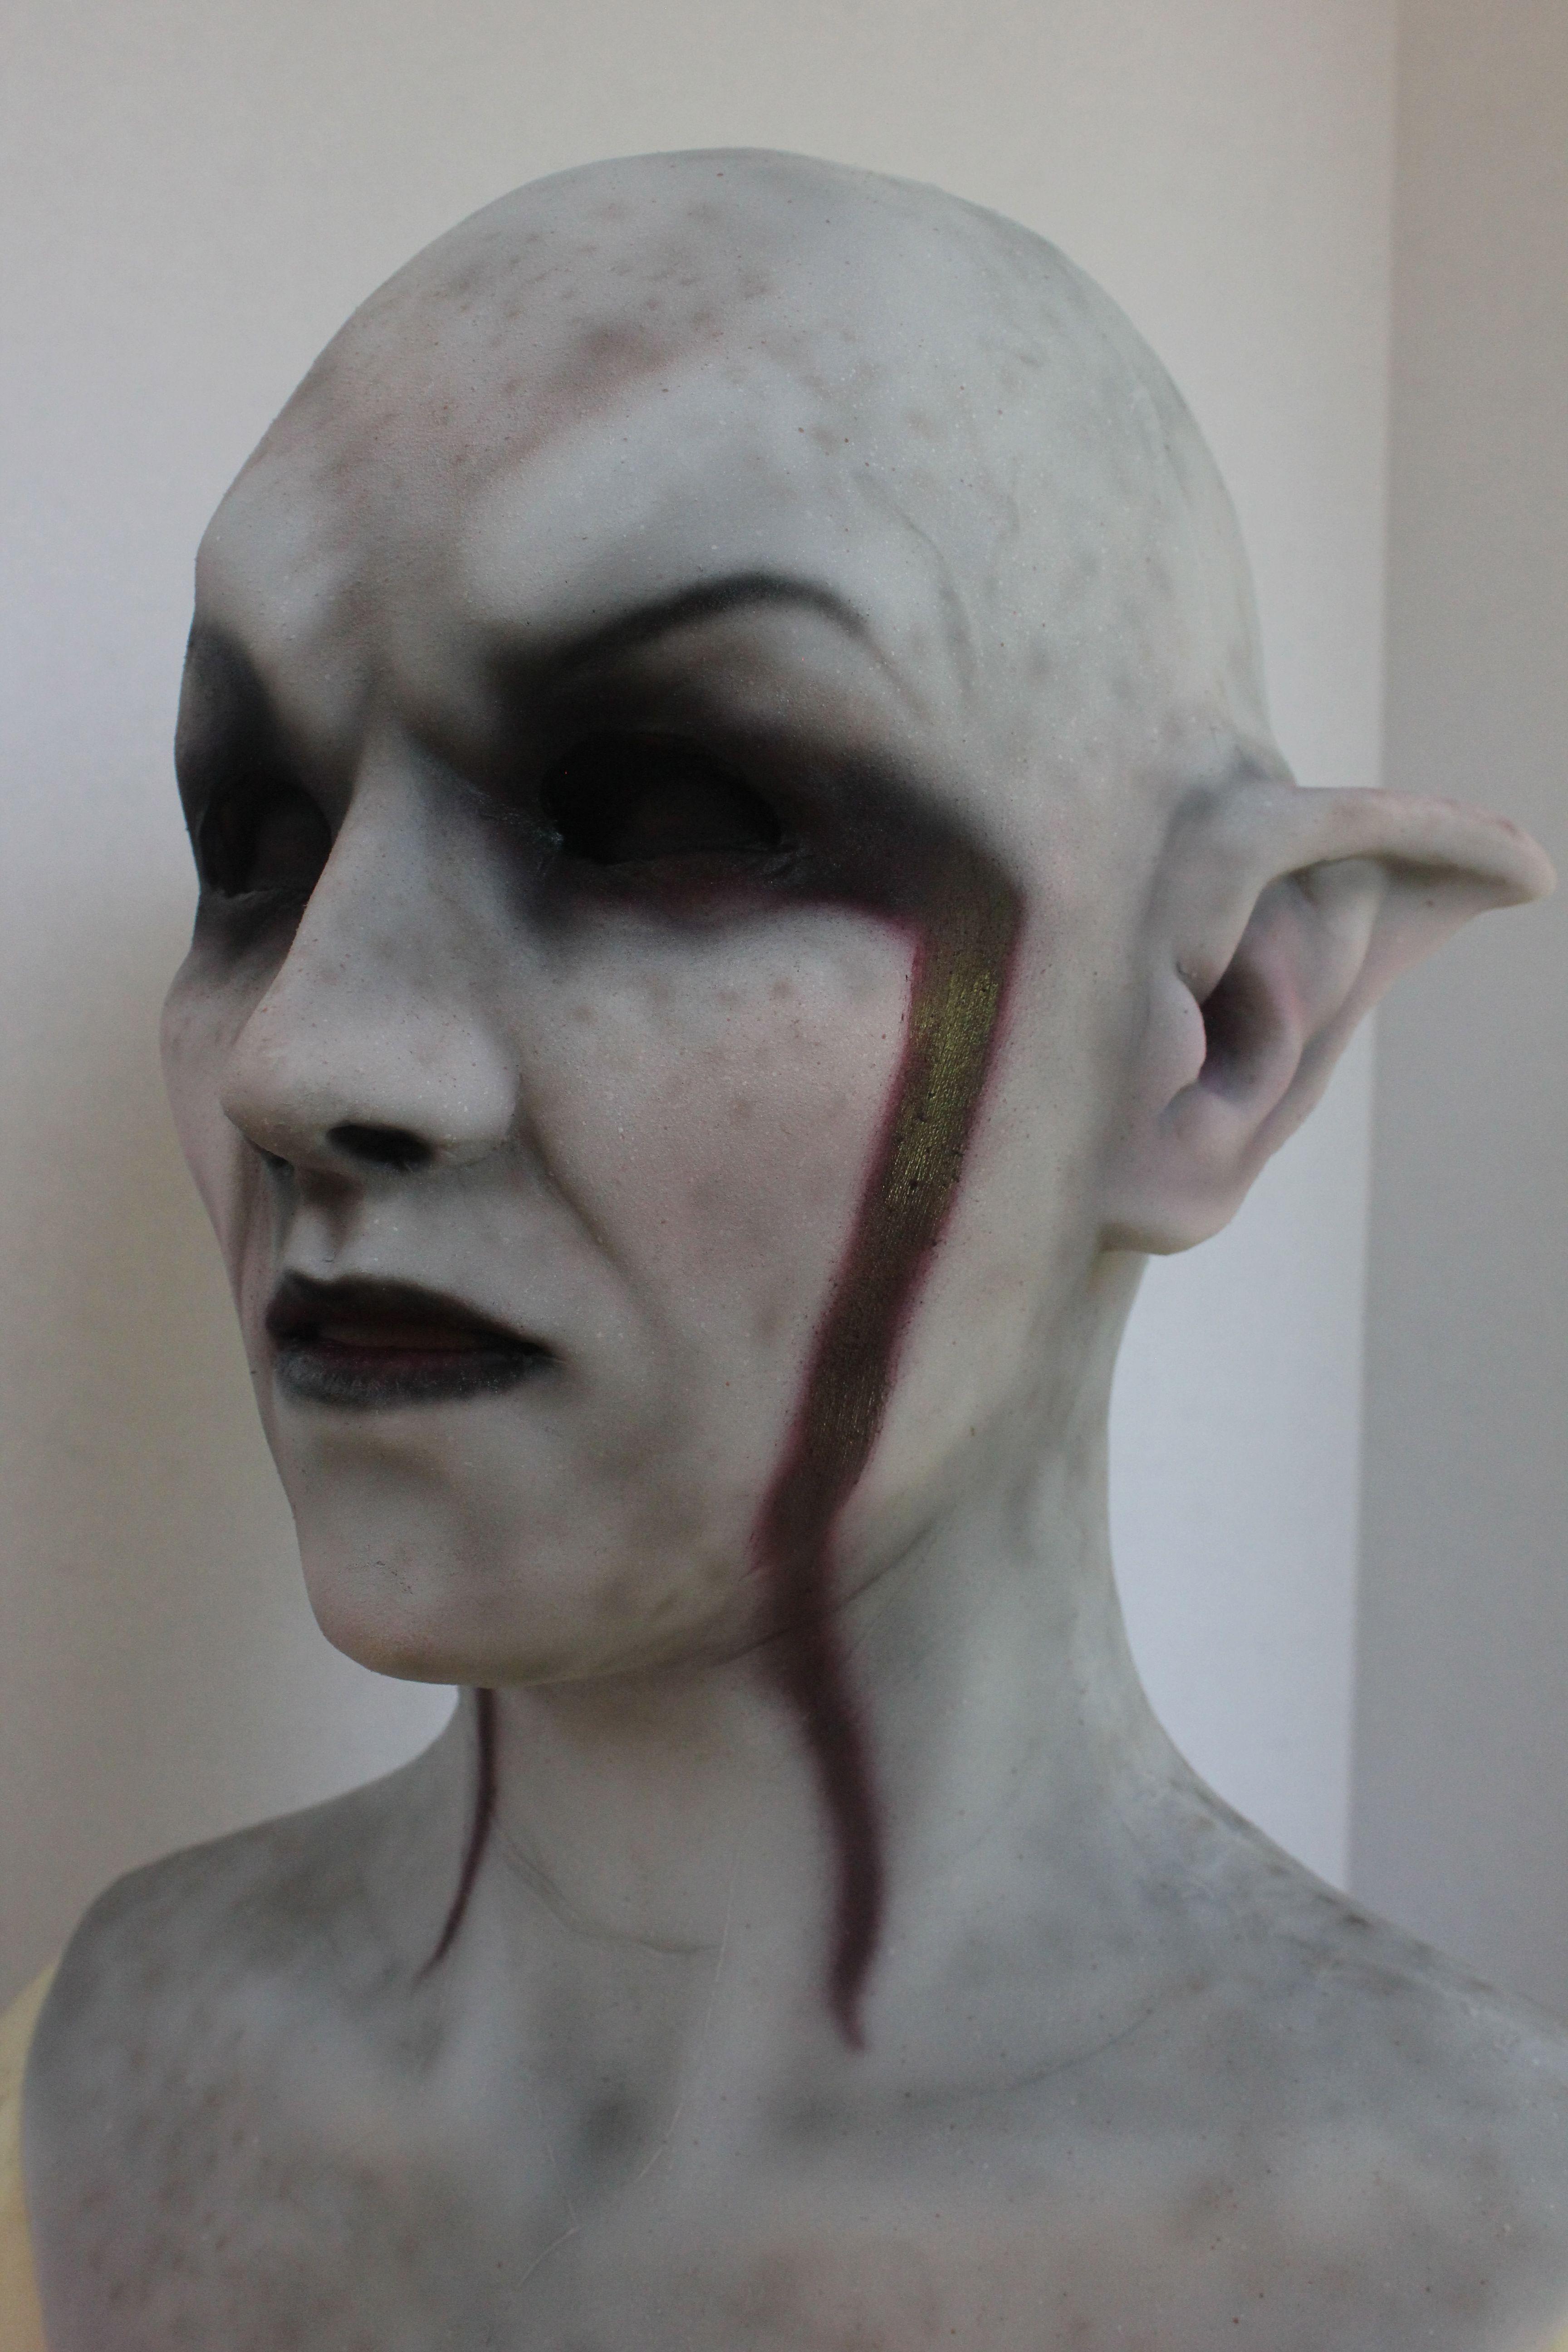 Khajiit mask based on an Abbyssinian Cat | Finished Masks in